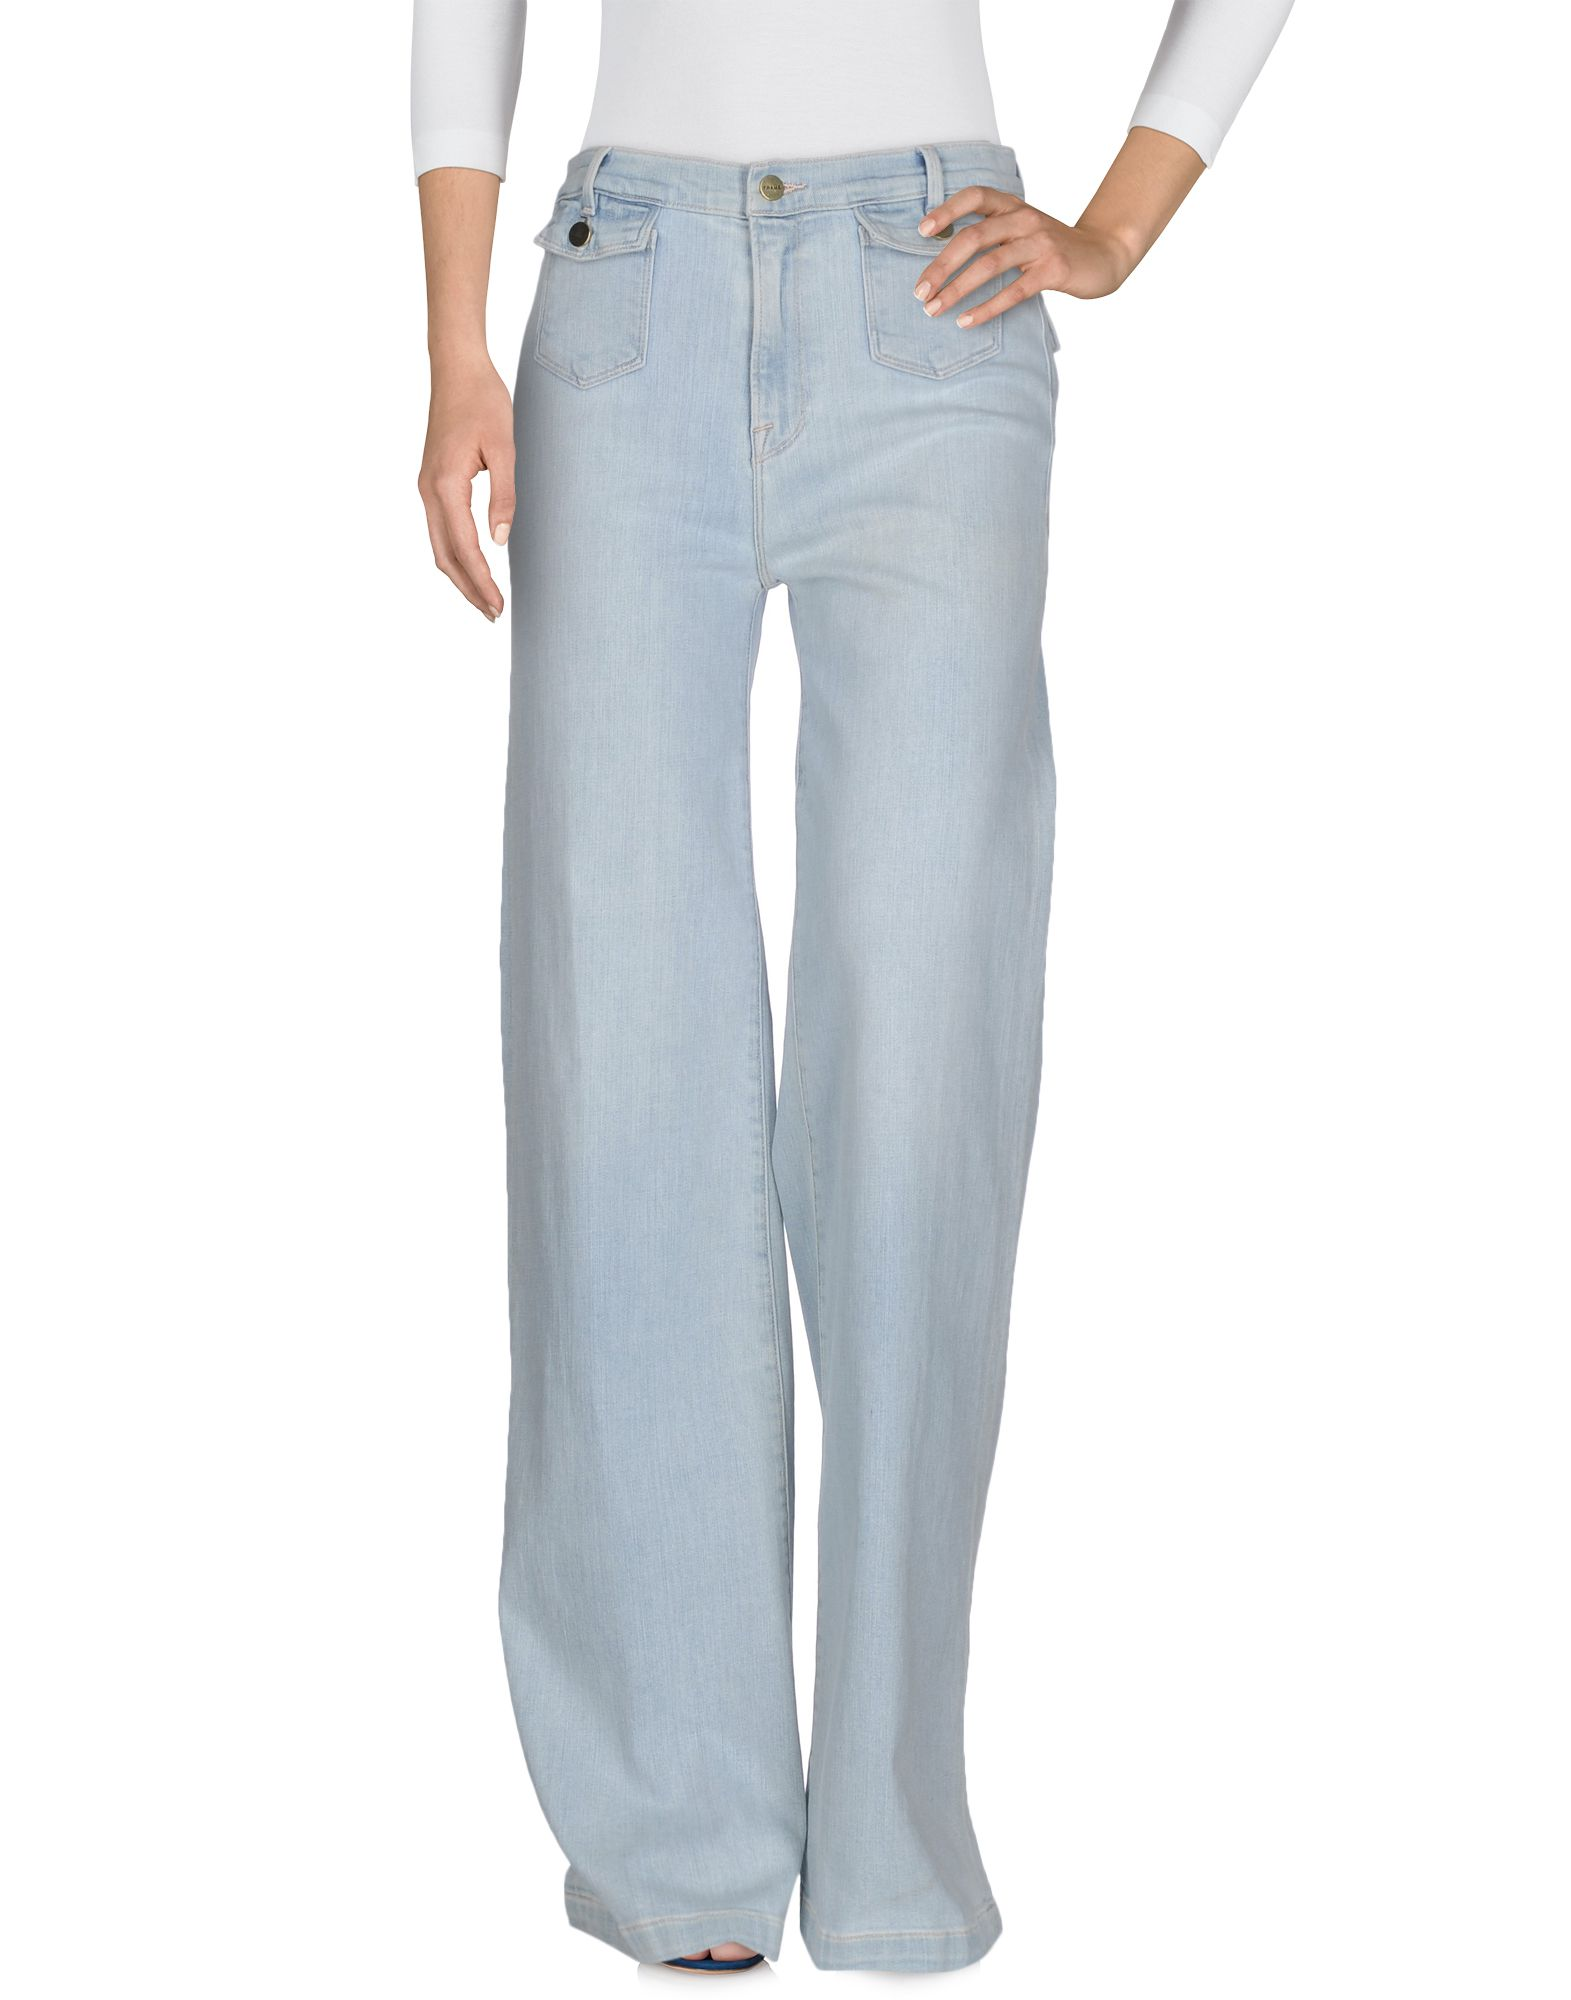 FRAME Damen Jeanshose Farbe Blau Größe 3 - broschei